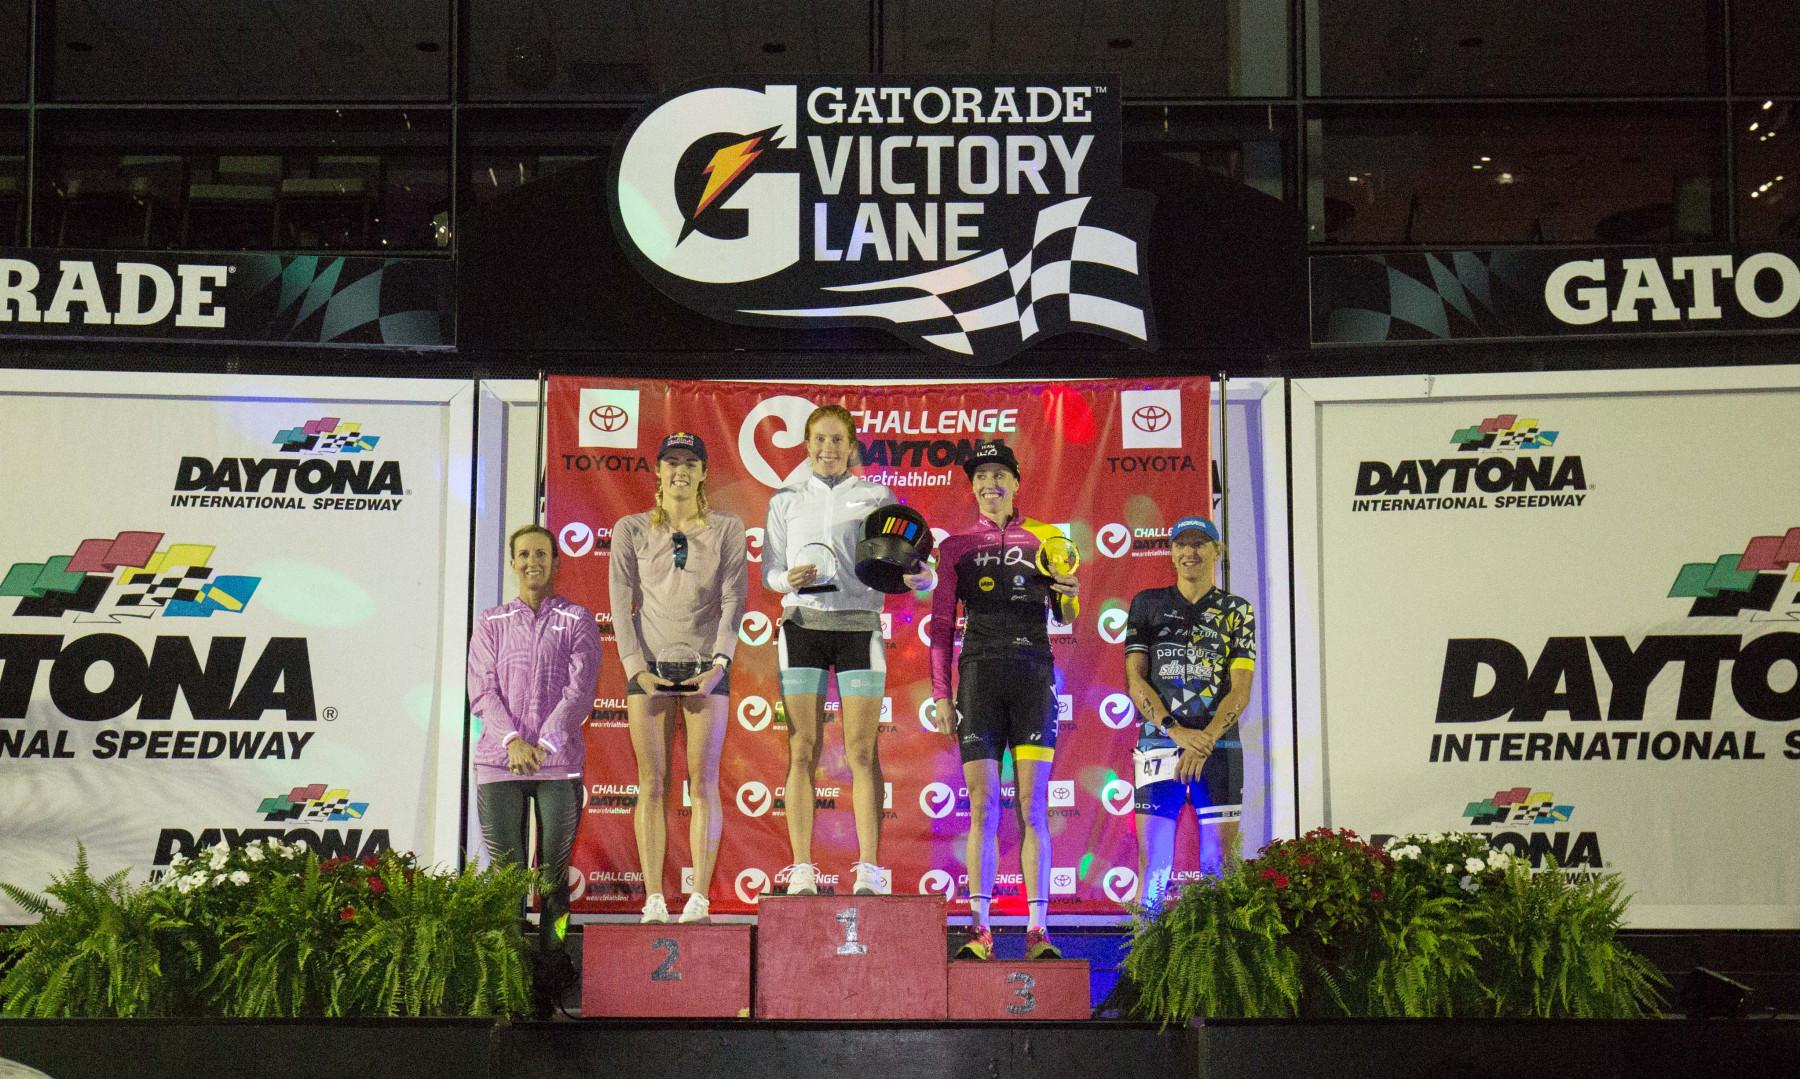 Challenge Daytona 2019 © José Luis Hourcade